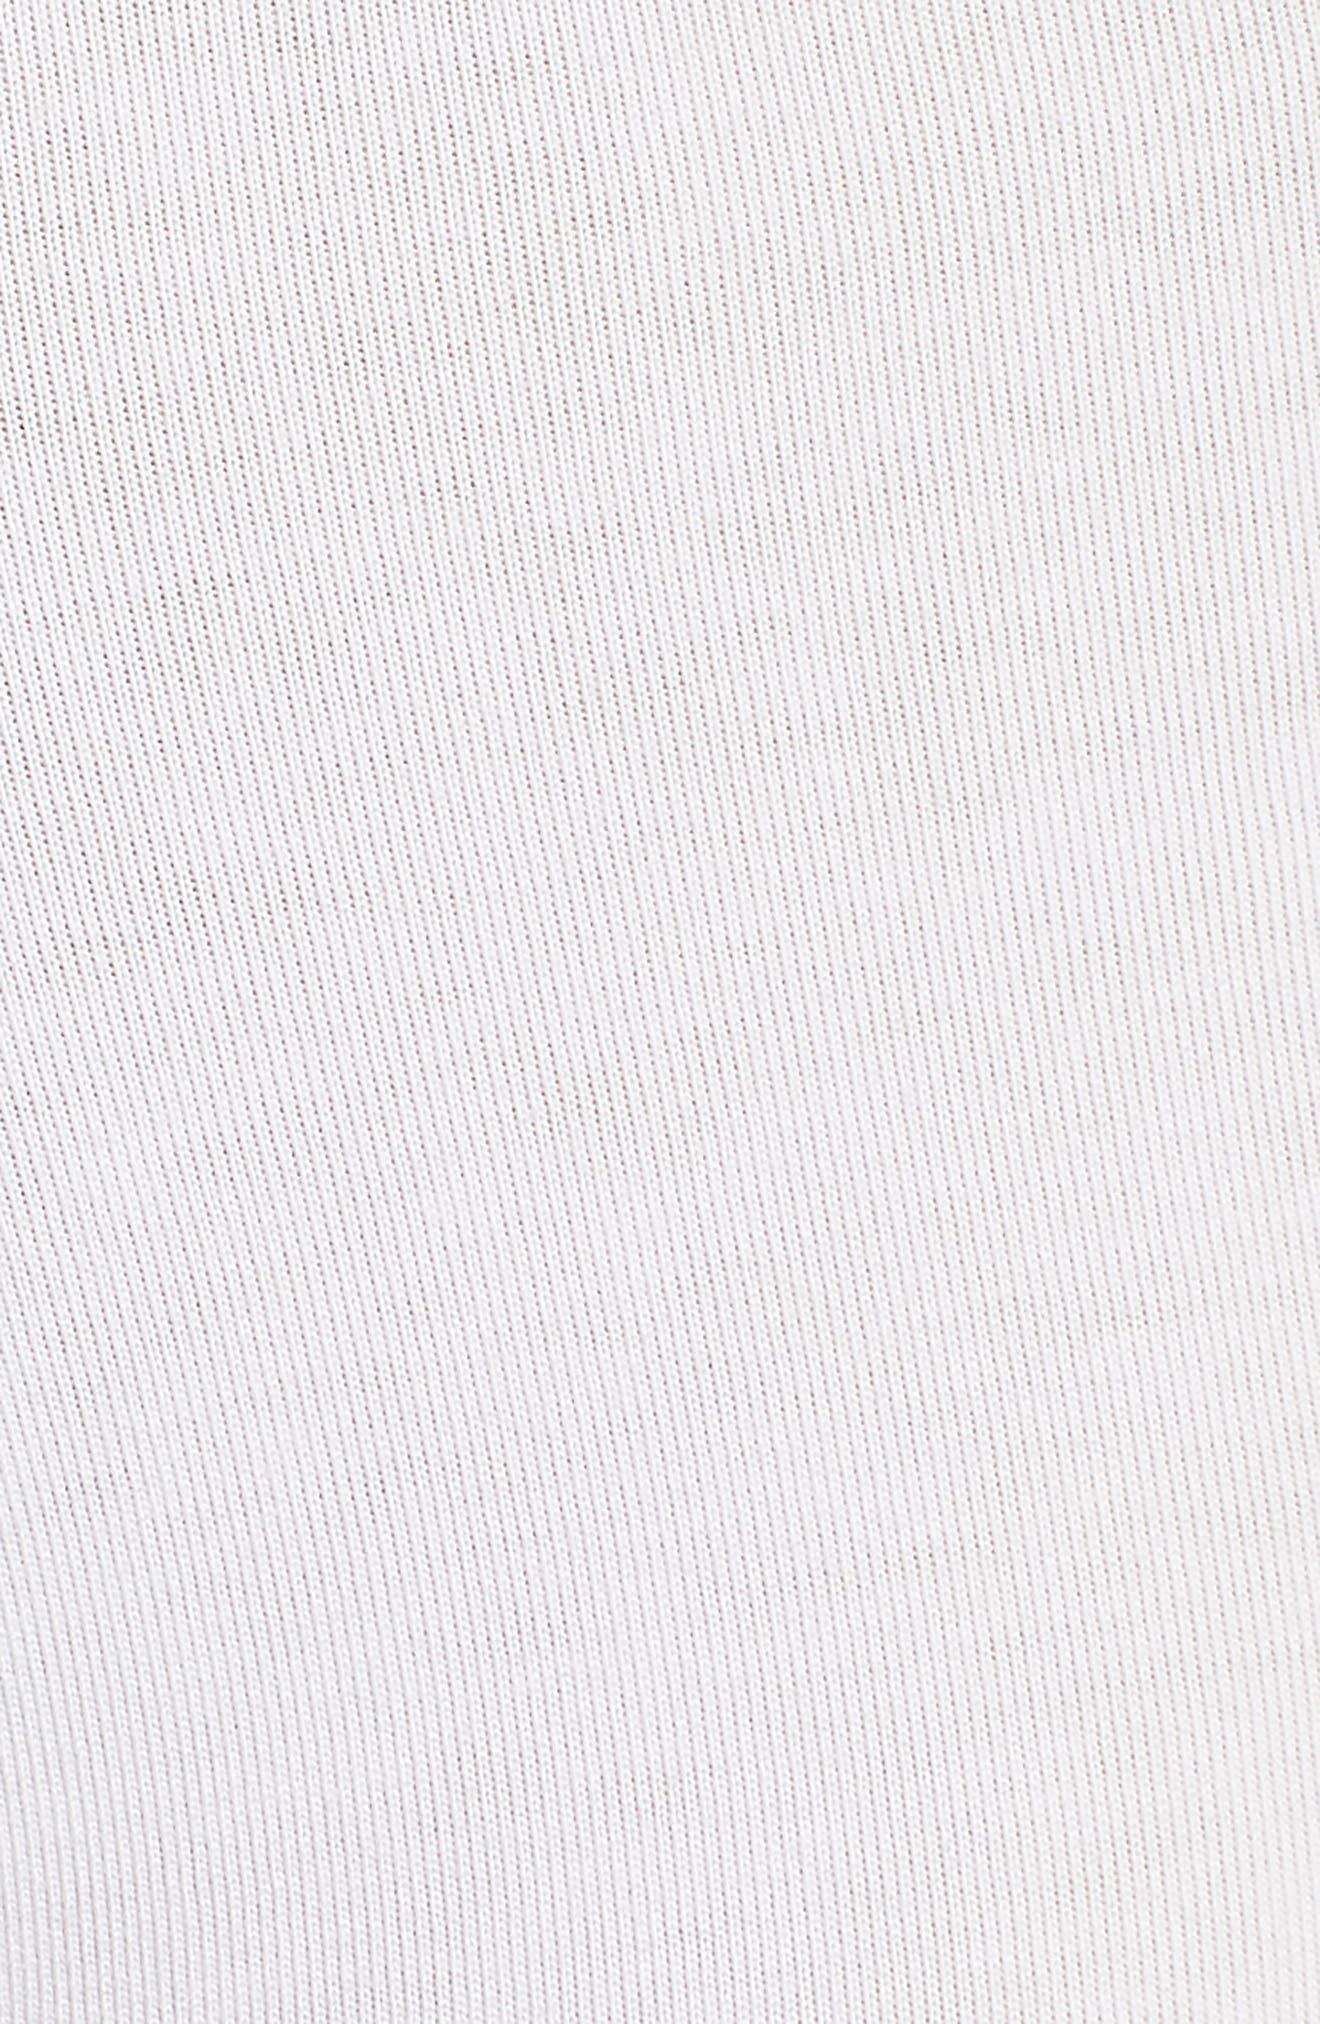 3-Pack Boxer Briefs,                             Alternate thumbnail 6, color,                             WHITE